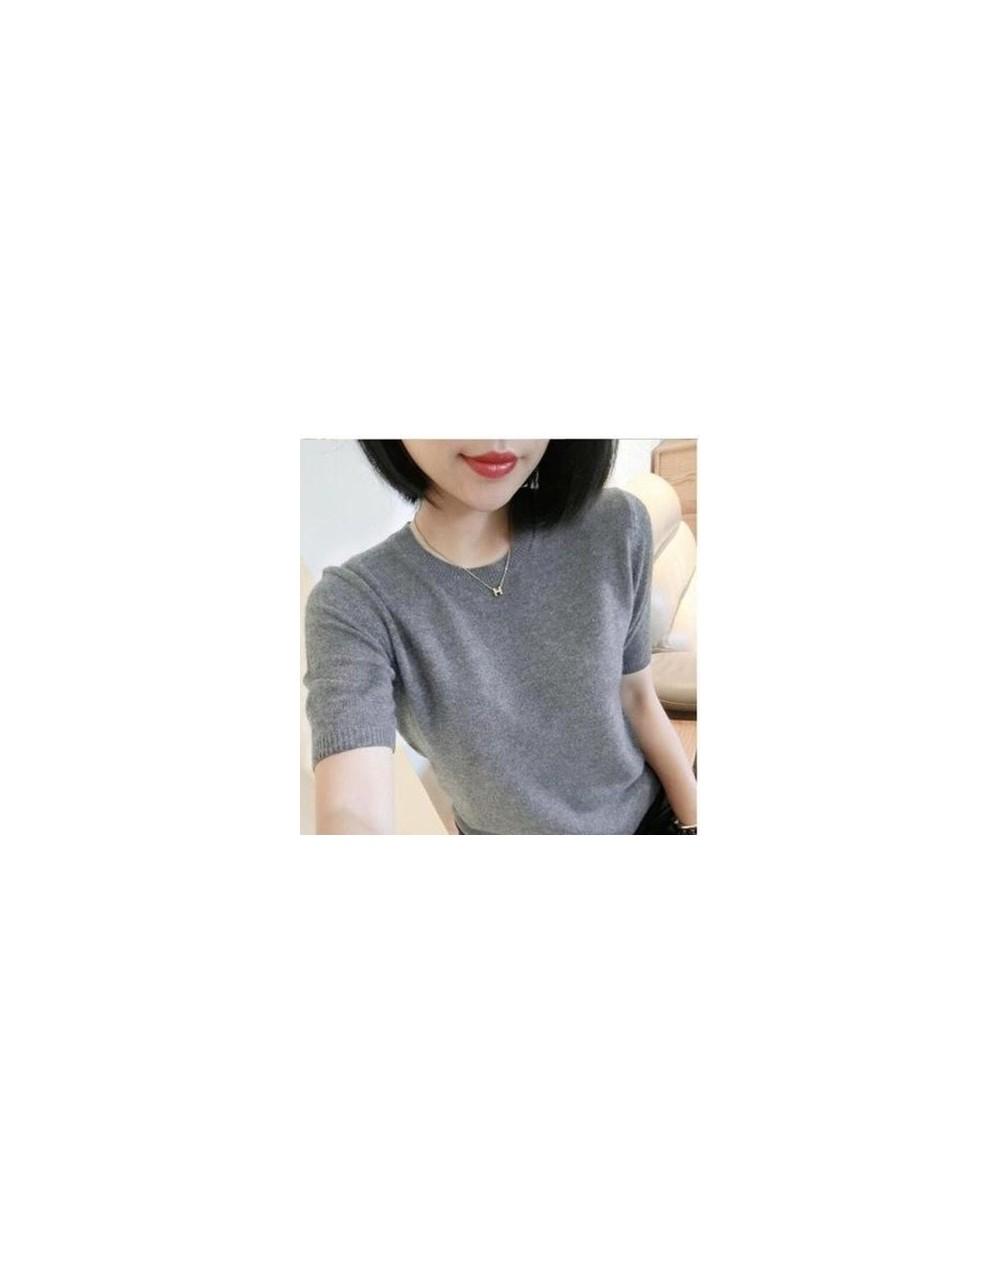 Cashmere Blended Knitted Sweater Women Tops Summer V-neck Short Sleeve Soft Comfortable Solid Color Shirt Sweater Pull - lig...